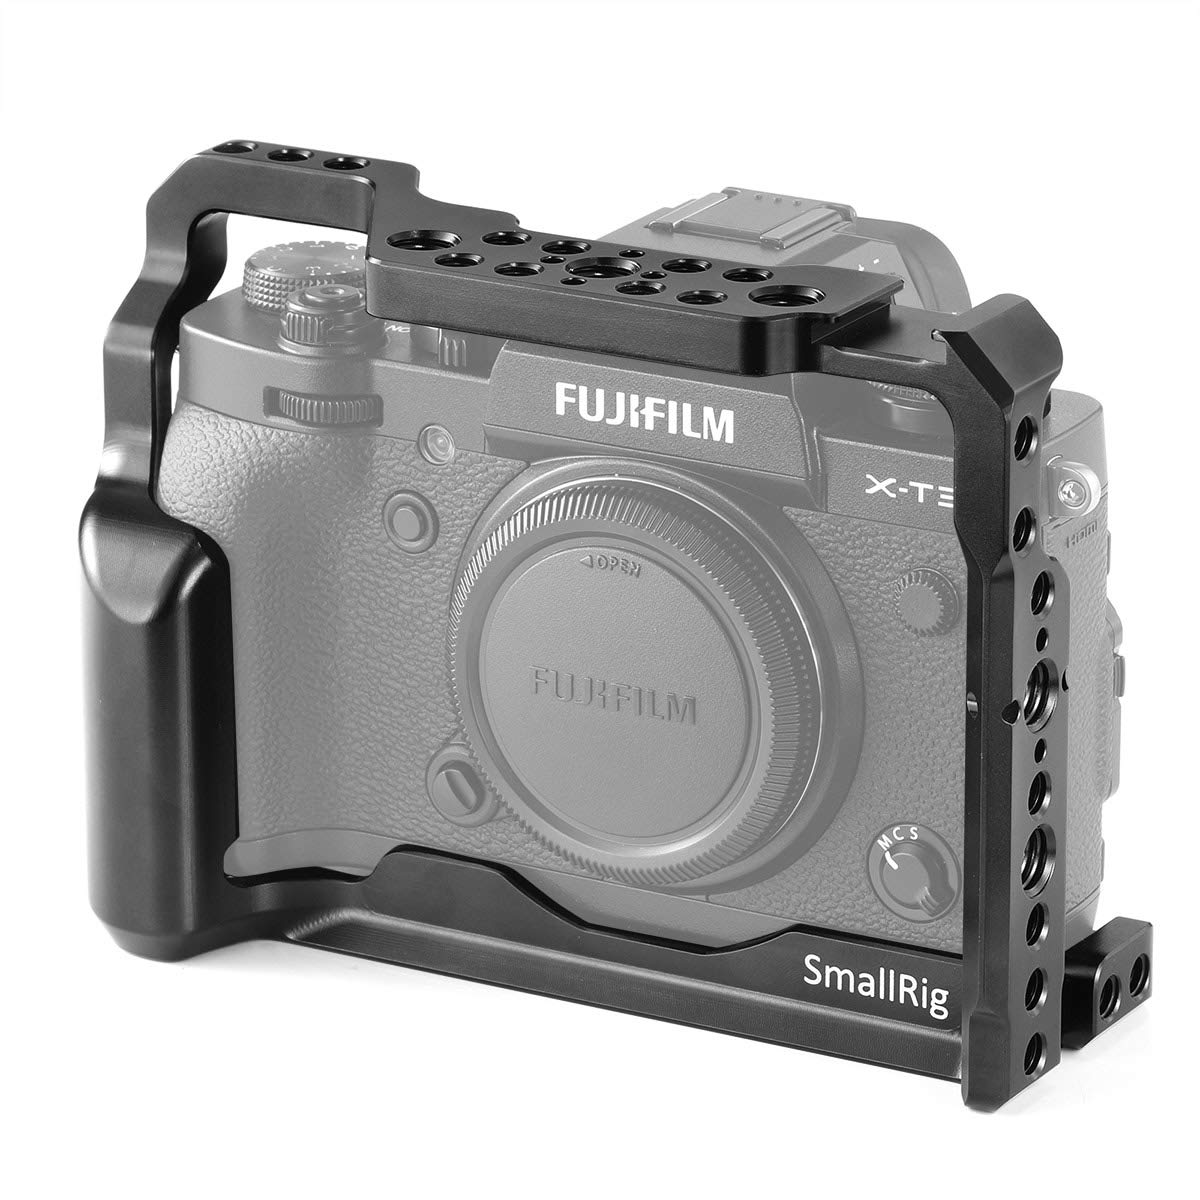 SMALLRIG Camera Cage for Fujifilm X-T3, Aluminum Alloy Cage with Cold Shoe, NATO Rail, Threaded Holes for Arri 3/8',1/4'-20,3/8'-16 (2228) Threaded Holes for Arri 3/8 1/4-20 3/8-16 (2228)